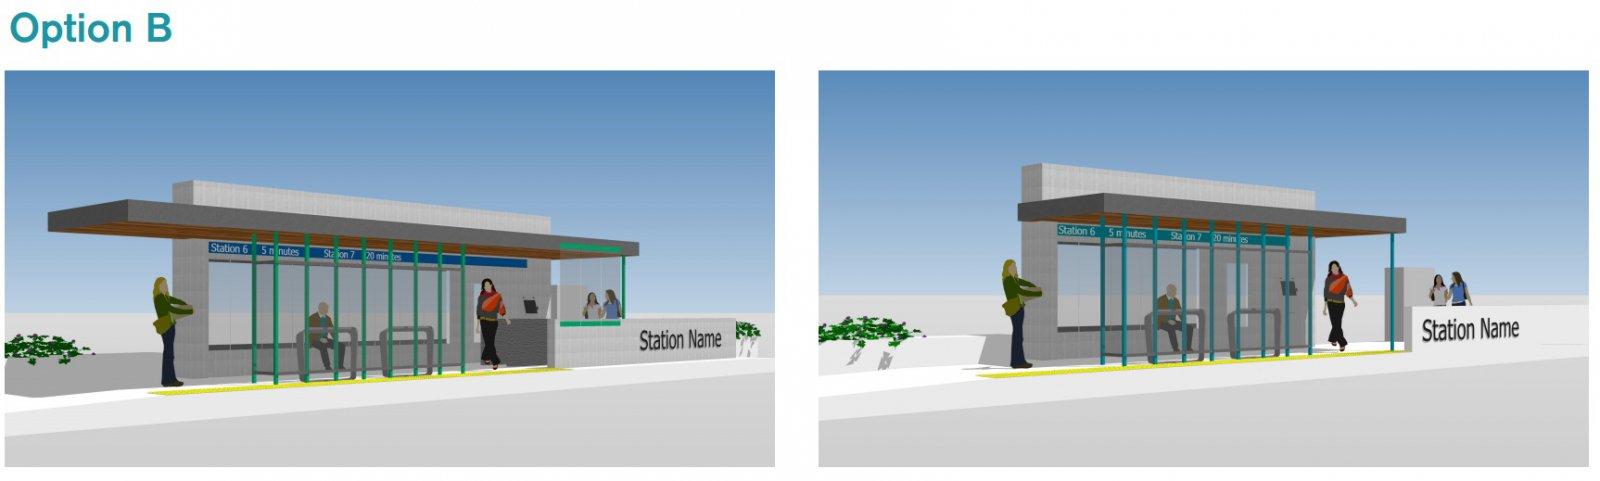 BRT Station Option B